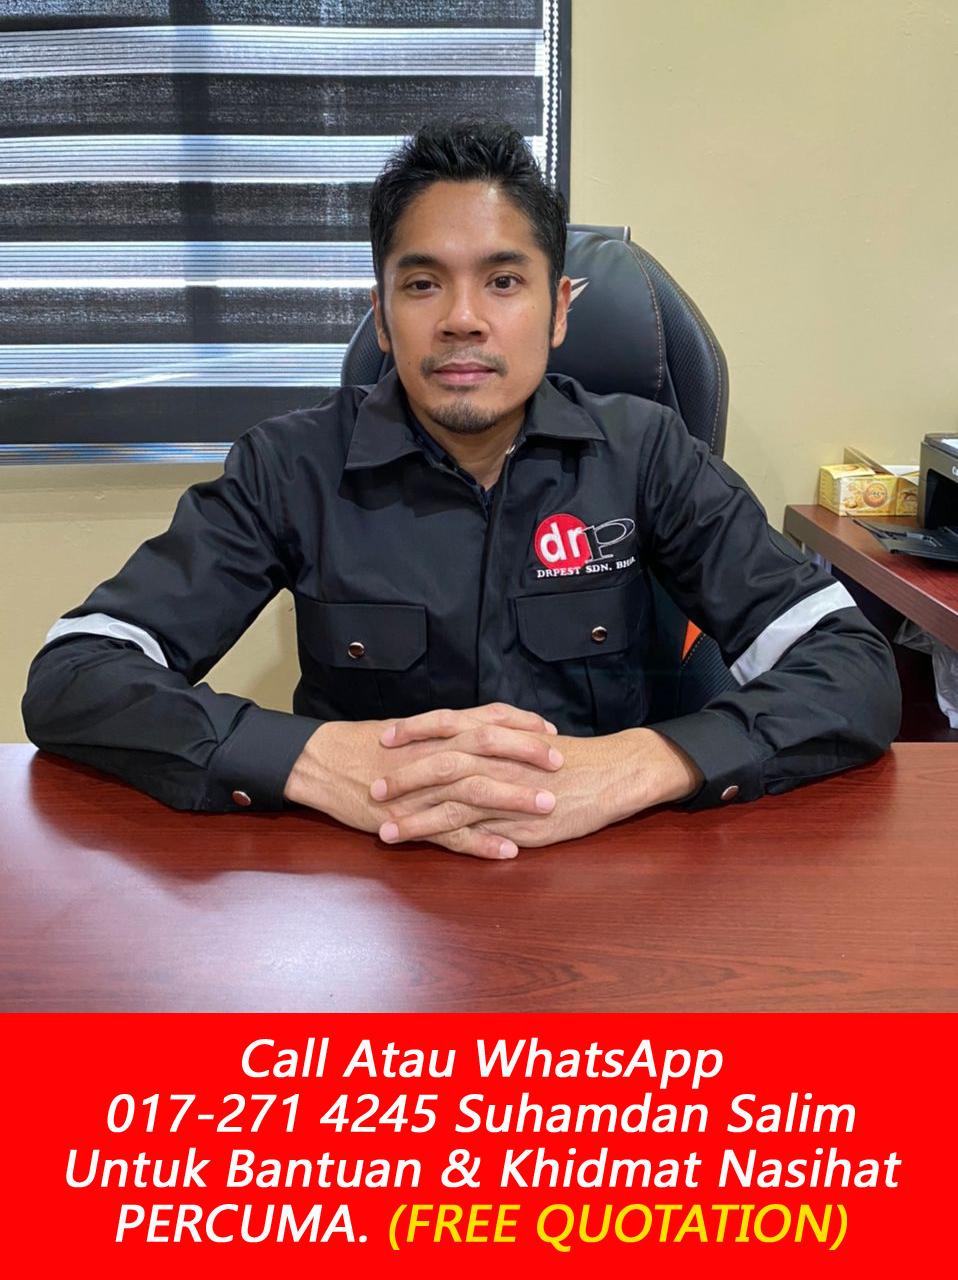 drpest sdn bhd drp maintenance and services syarikat kawalan serangga bumiputra yang berlesen the best company pest control near me area Bukit Kiara kl near me